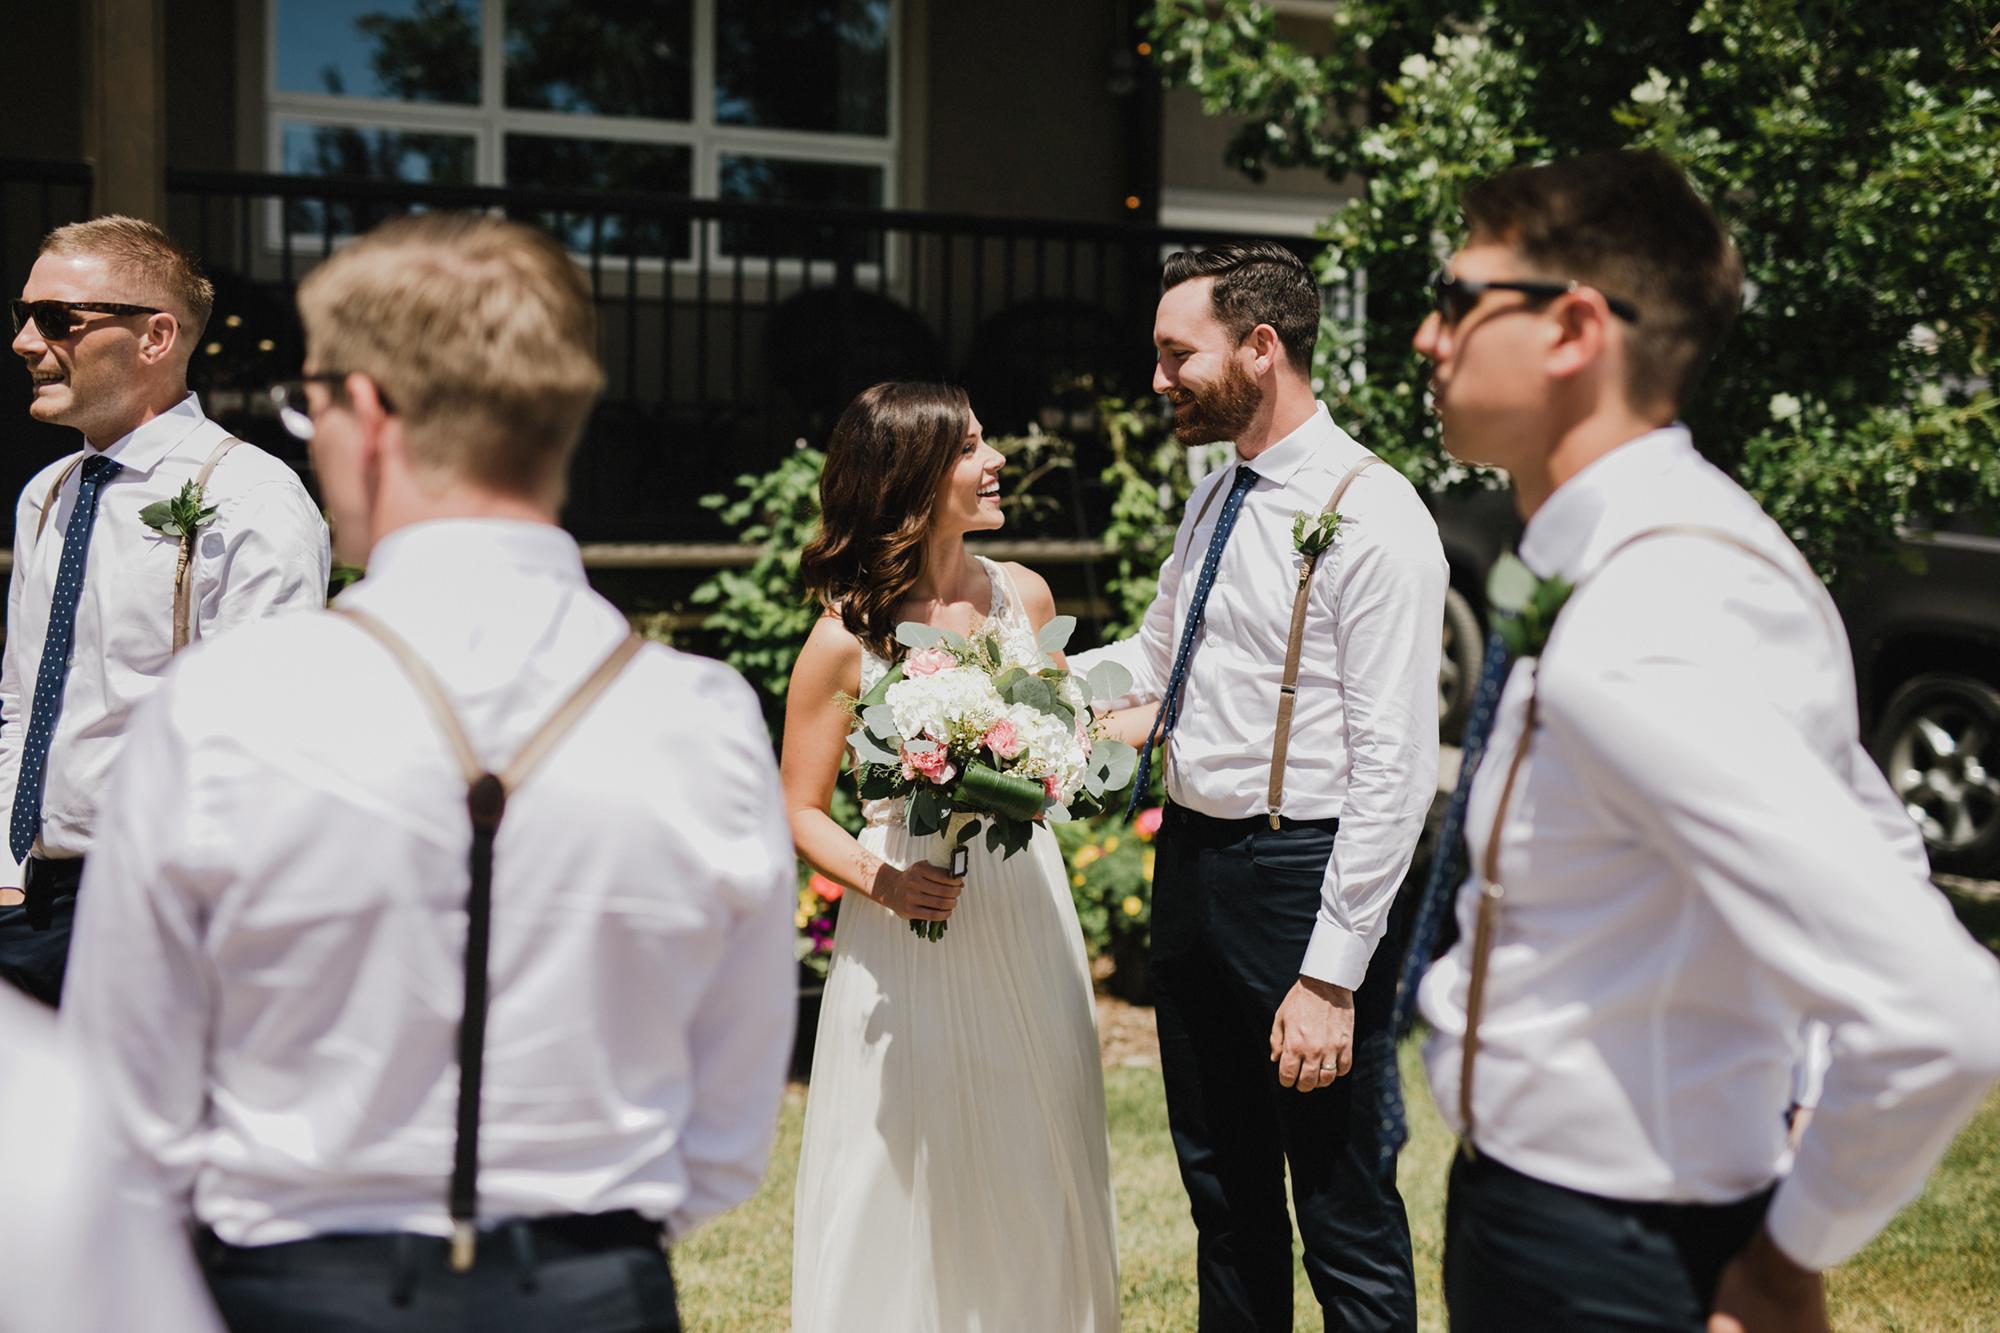 Flower Farm Crowsnest Pass Wedding -035.JPG